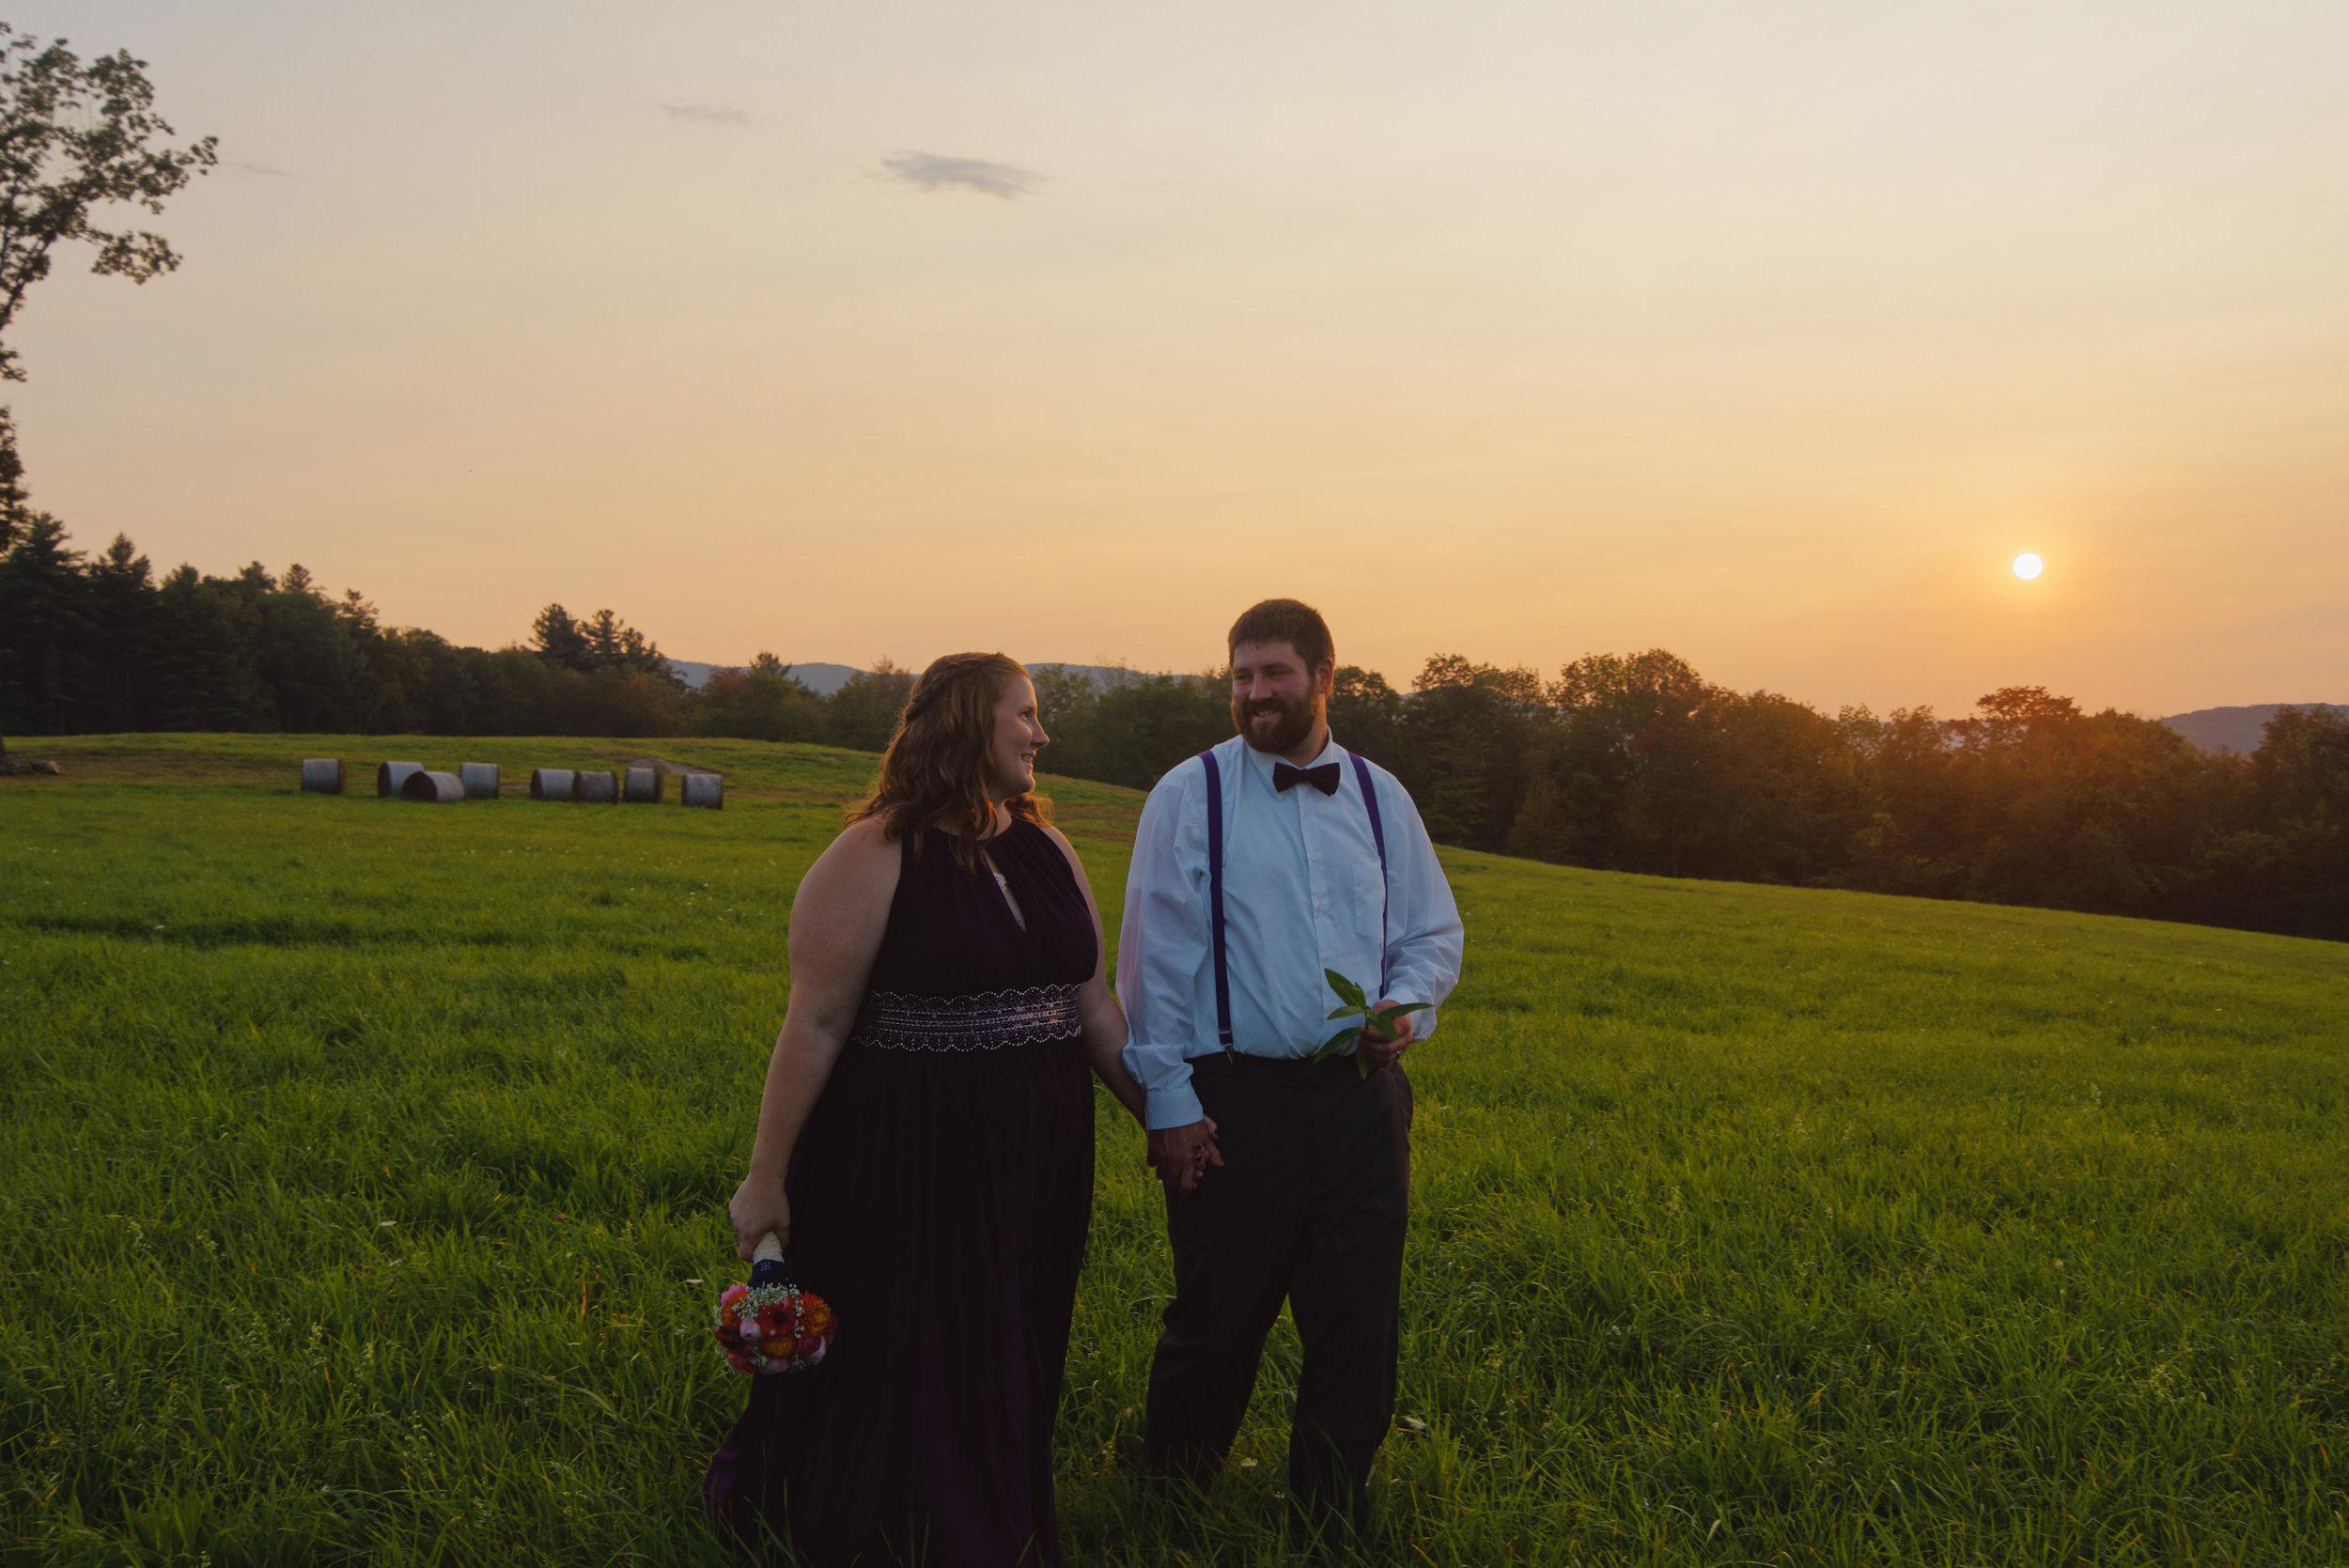 Jenn&Corby_Field_Sunset_Walking_Laughing.jpg